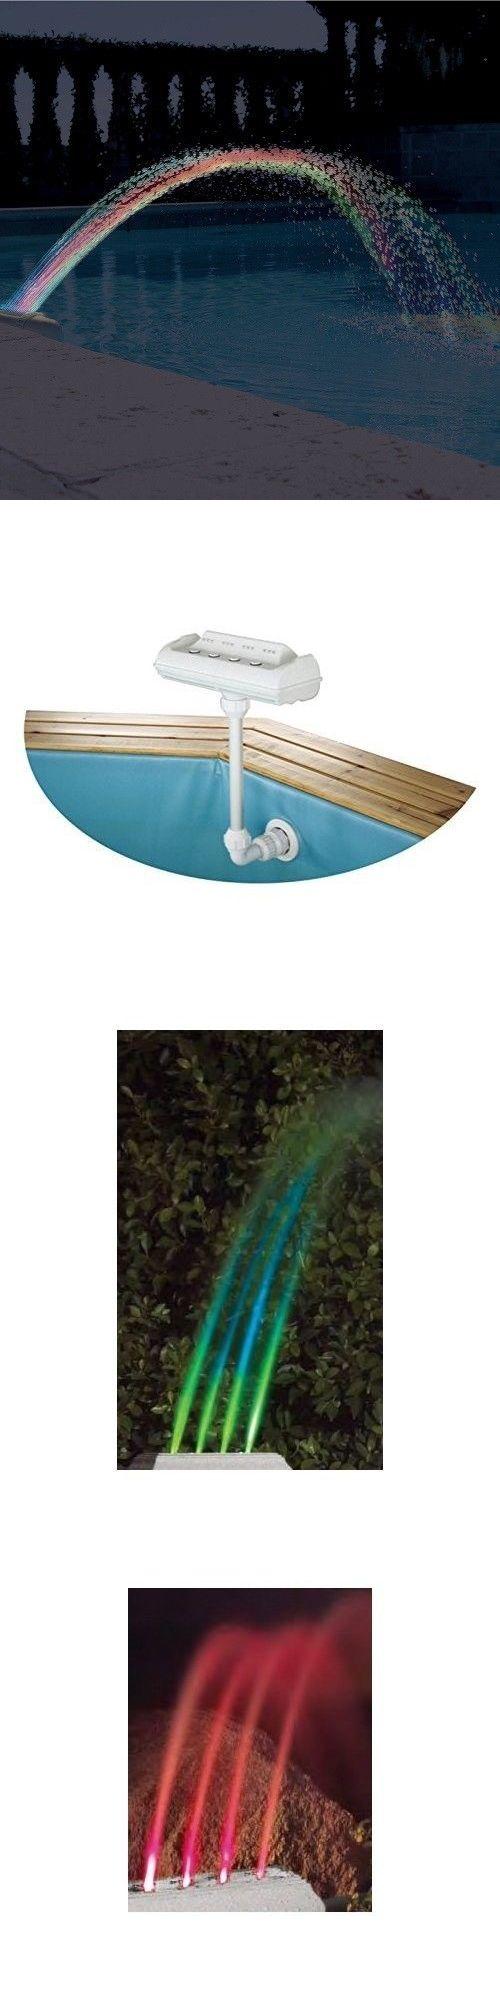 Best 25 above ground pool lights ideas on pinterest for Floating deck around above ground pool